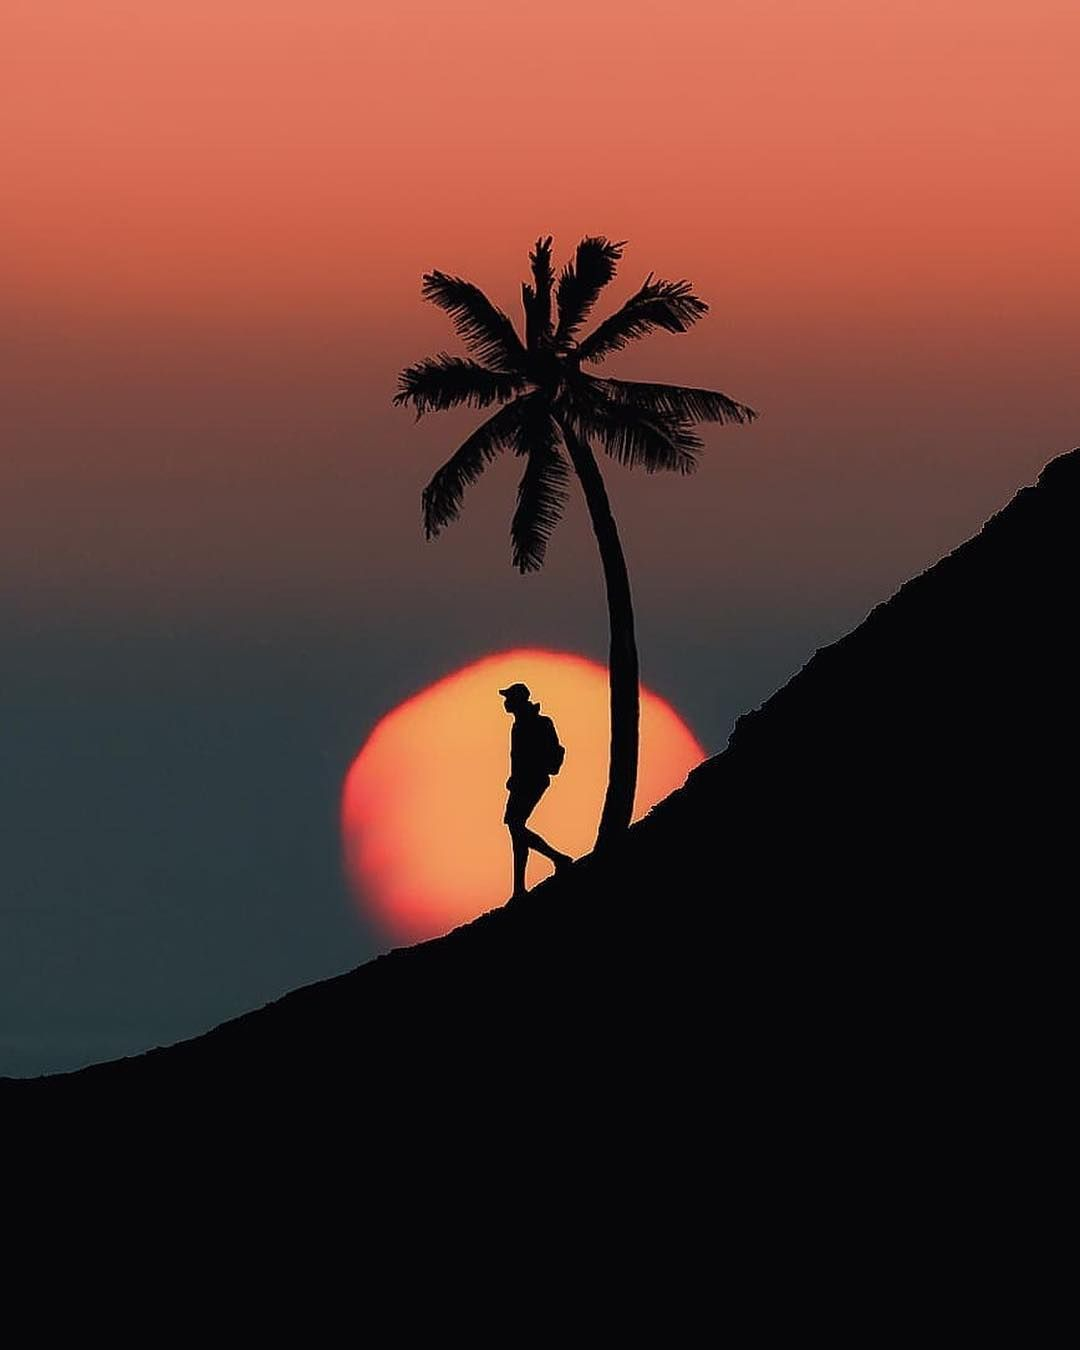 Photo by @llomp_art  Congrats  Tebrikler! Selected by  @wind.whisper  #creativityfound  #pursuepretty #dowhatyoulove #earthofficial  #DiscoverGlobe #Ig_Masterpiece #Global_Hotshotz #instavsco  #ig_mood #creativelife  #natgeotravel  #theworldshotz #visualoflife #sunsetsniper  #createcommune #creative #NatGeoLandscape  #bestvacations  #verilymoment #nature_lovers #bestcaptureglobal  #haffftalık3d #artsyheaven  #visualscollective #vsualambassadors #photooftheday #communityfirst #mextures